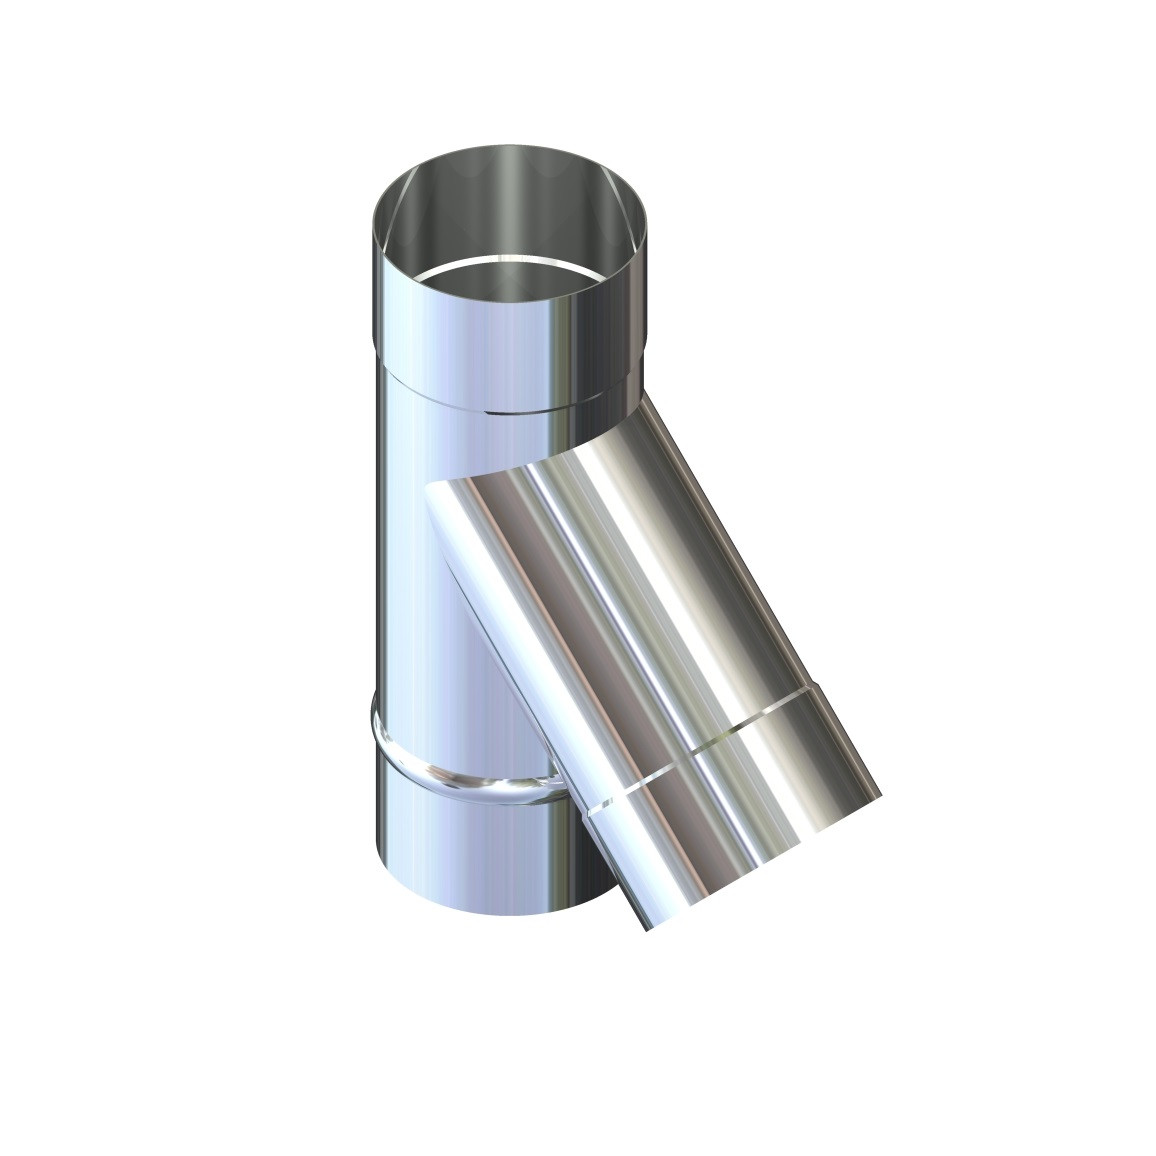 Тройник 45° для дымохода D-120 мм толщина 0,6 мм